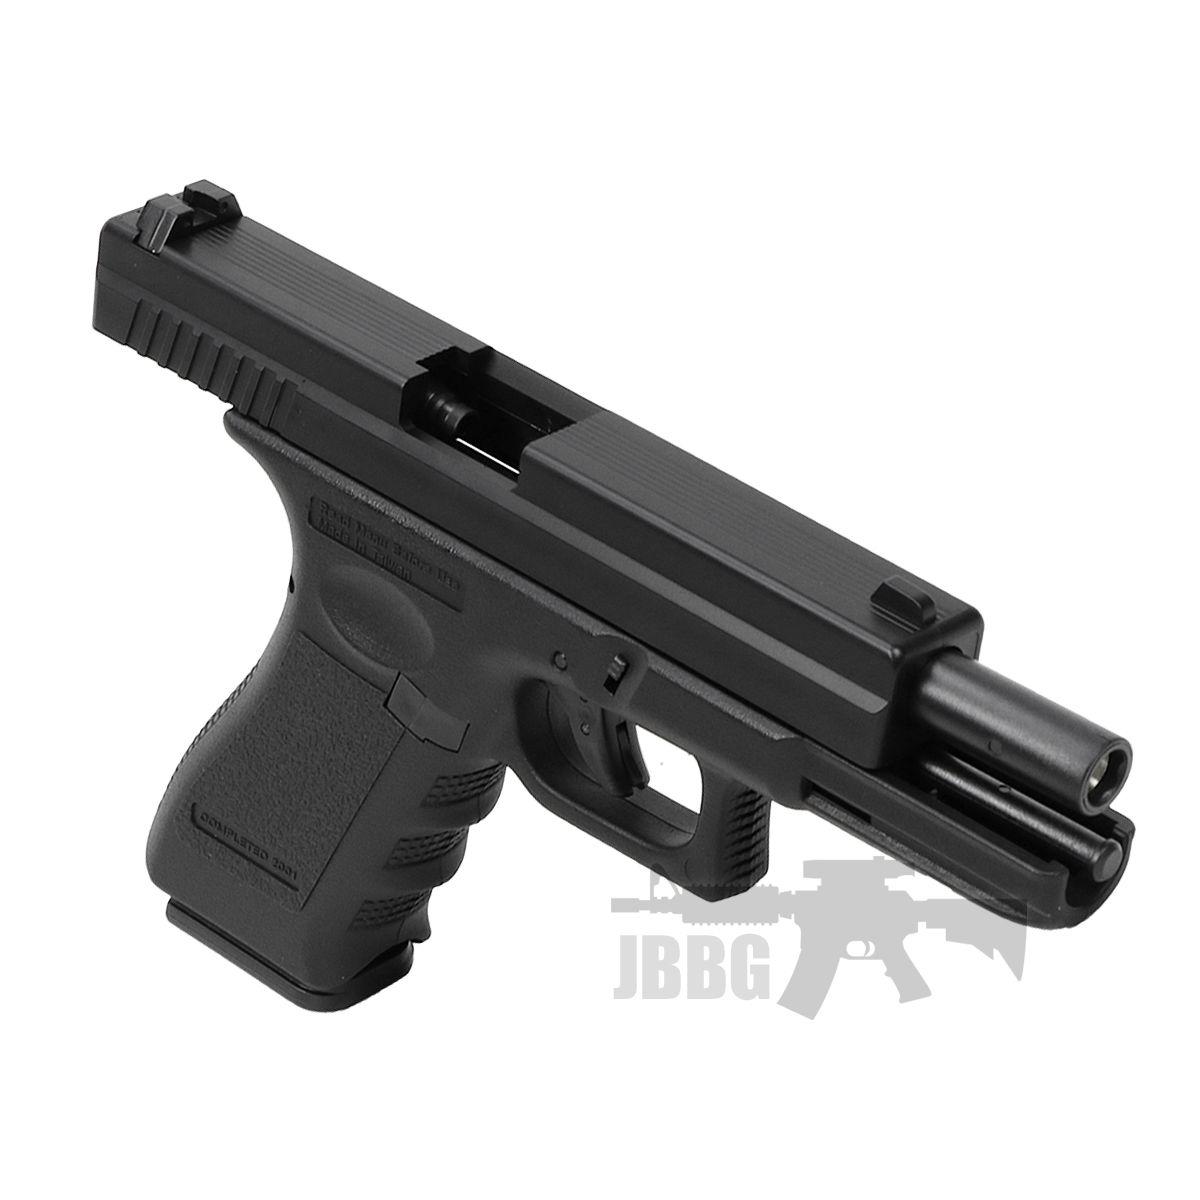 hg184 airsoft bb pistol 6